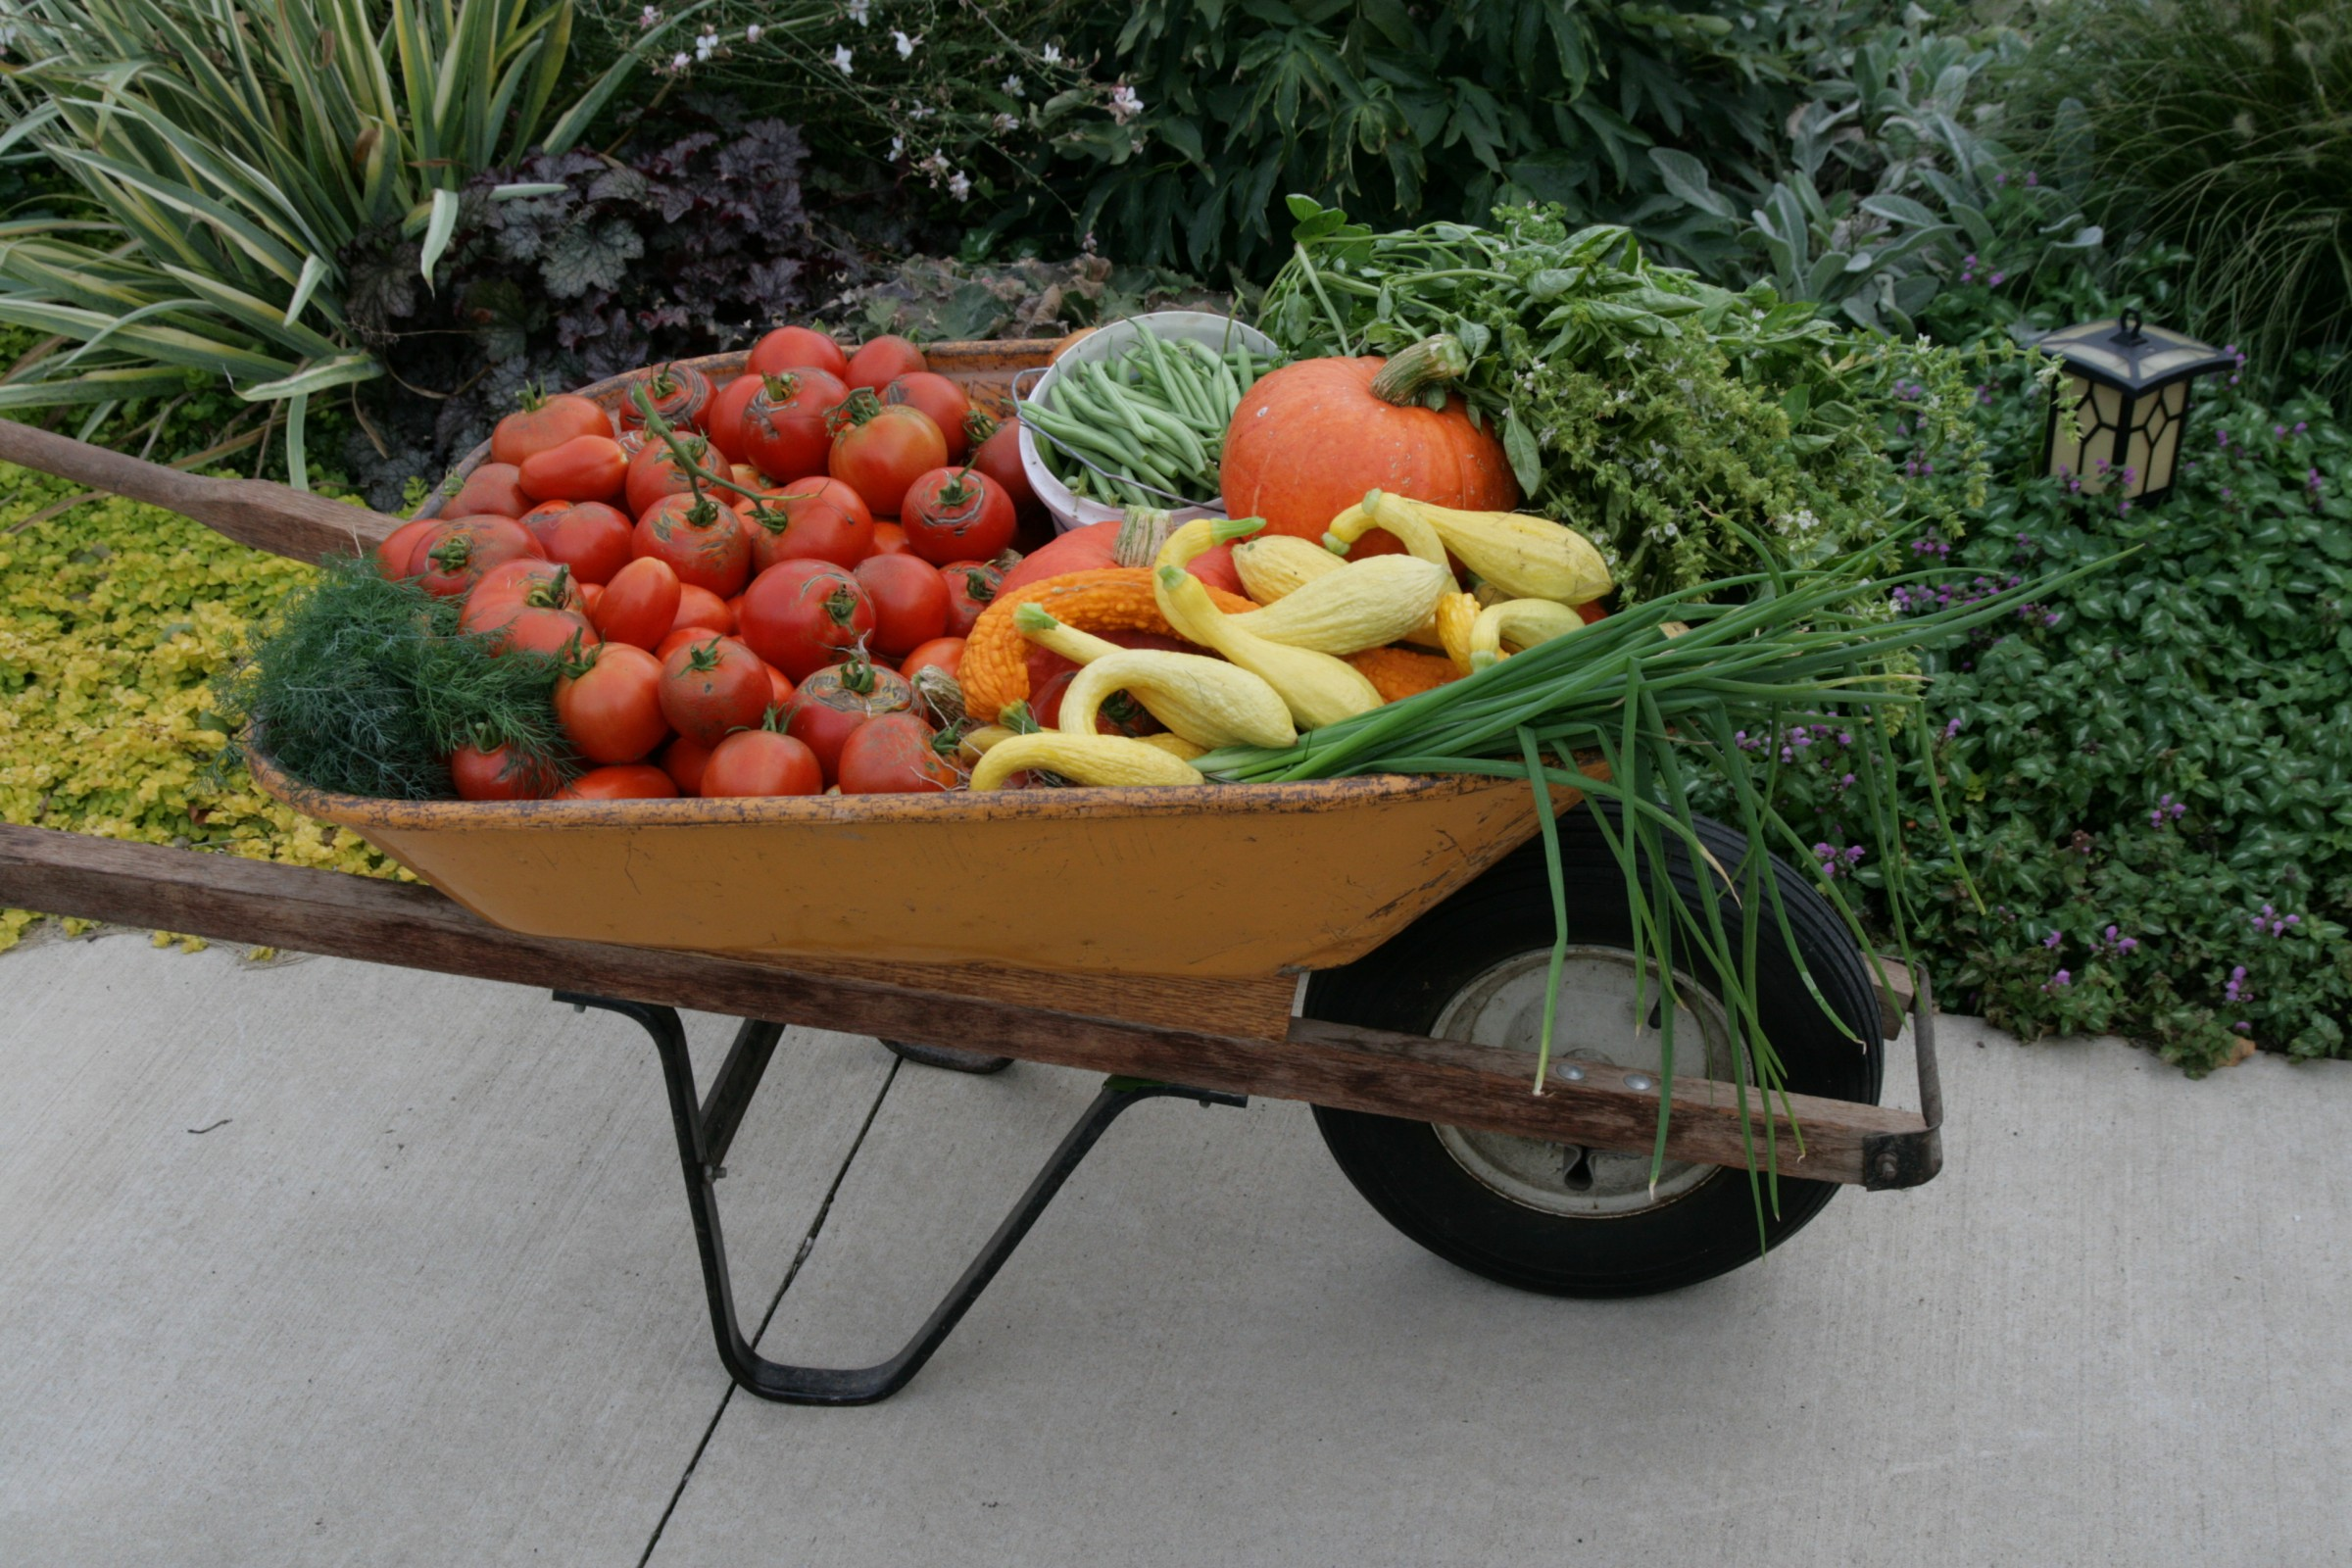 Wheelbarrow full of vegetable produce